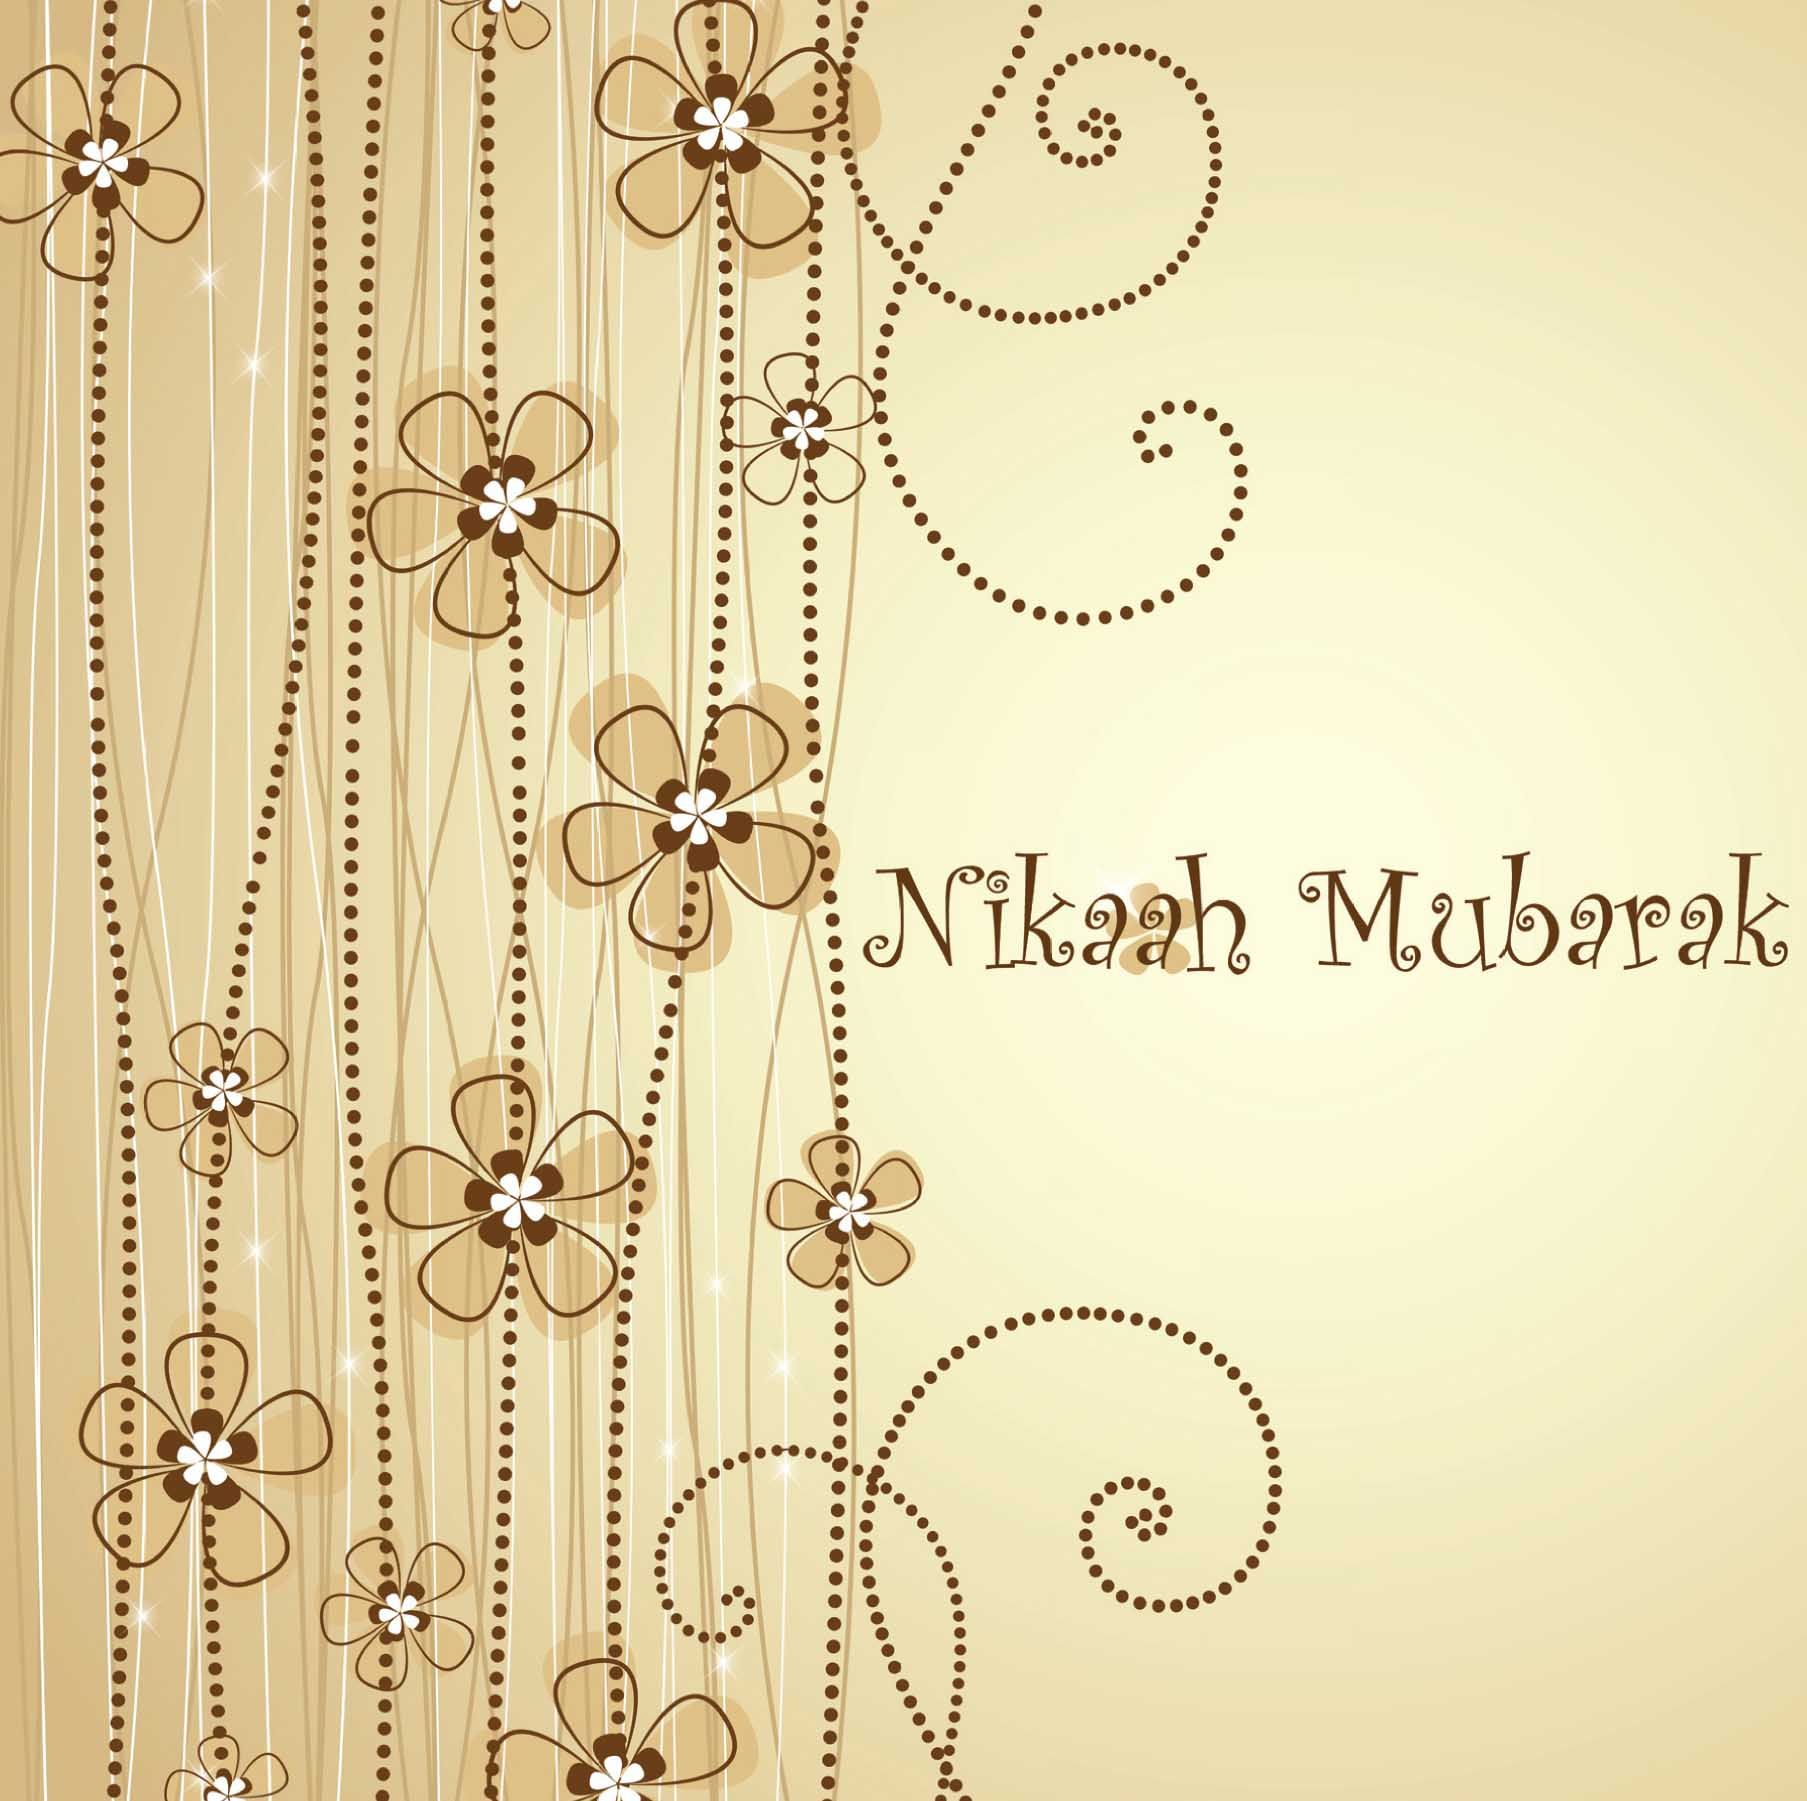 Nikaah mubarak islamic greeting cards bridal mehndiwllery nikaah mubarak islamic greeting cards kristyandbryce Image collections